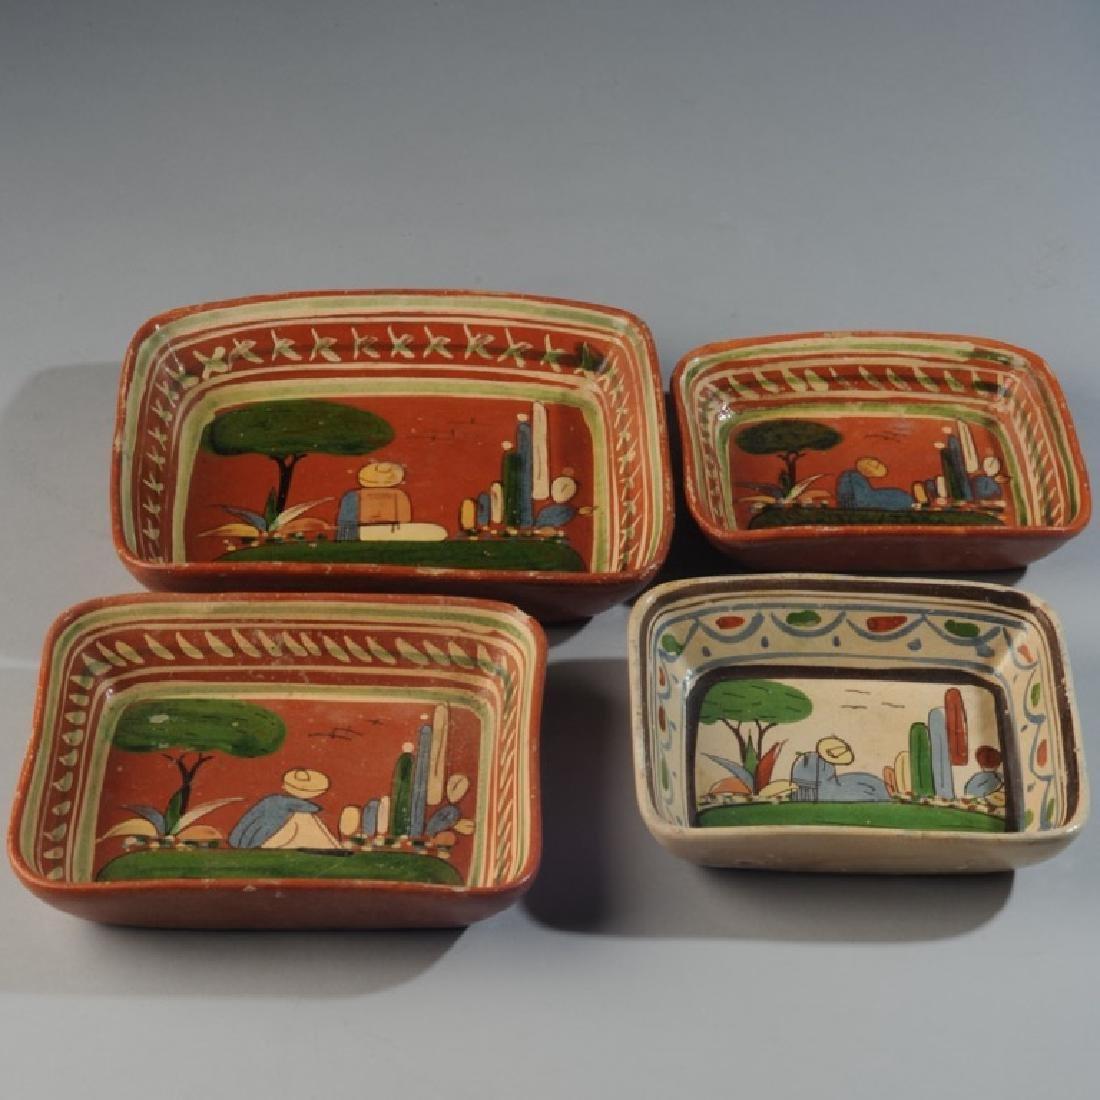 Circa 1940s Vintage Mexican Tlaquepaque Tourist Pottery